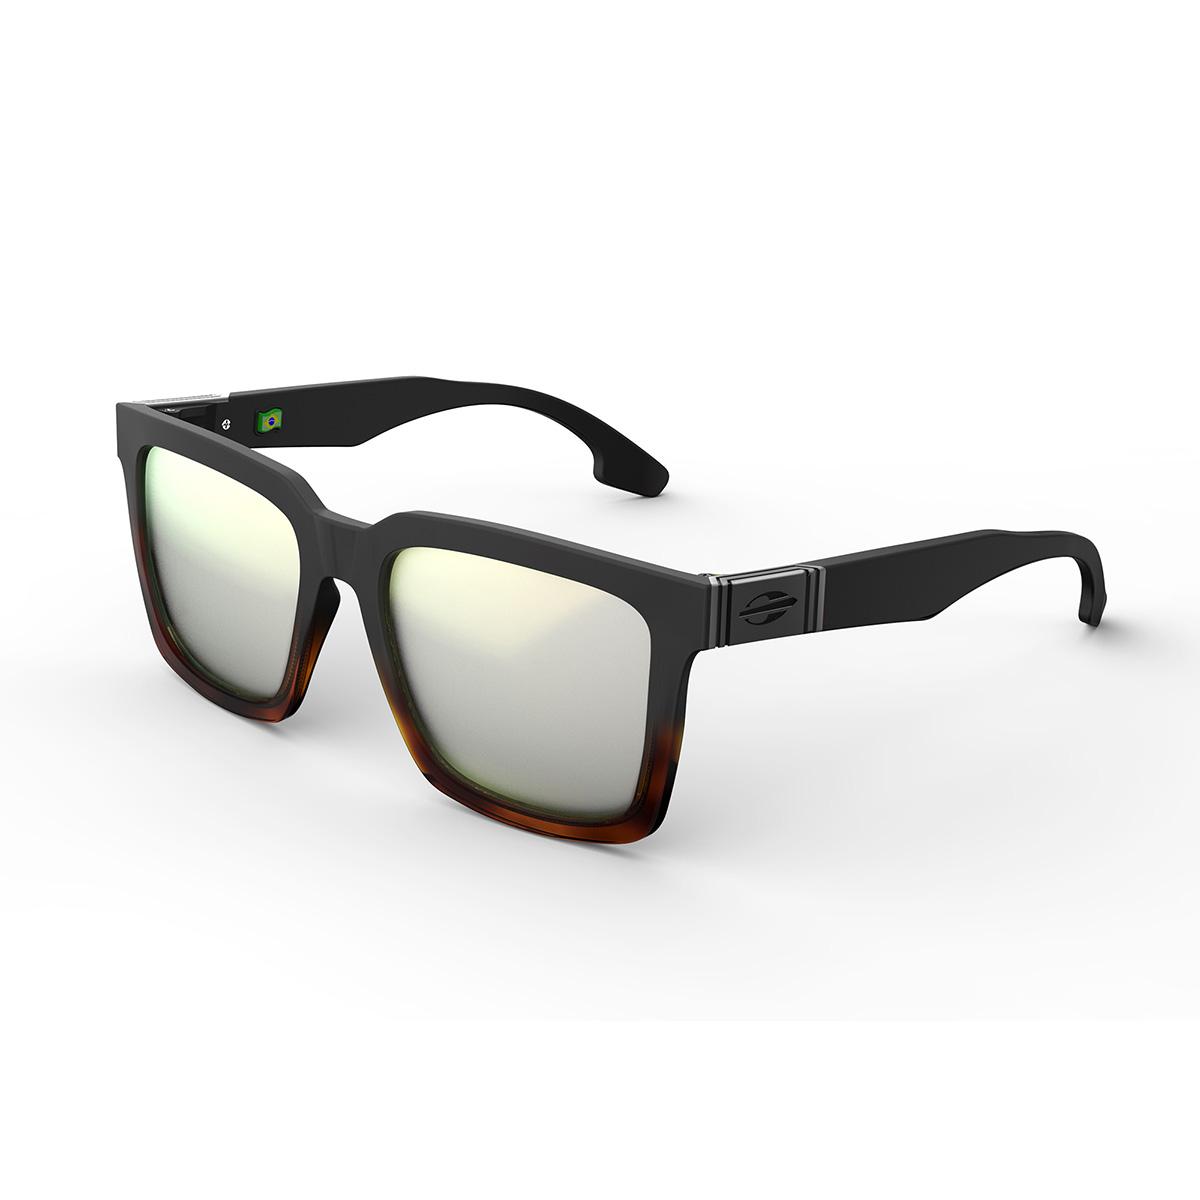 4d835a54695fc Óculos de Sol Mormaii Sacramento M0032A4880MormaiiMormaii de ...